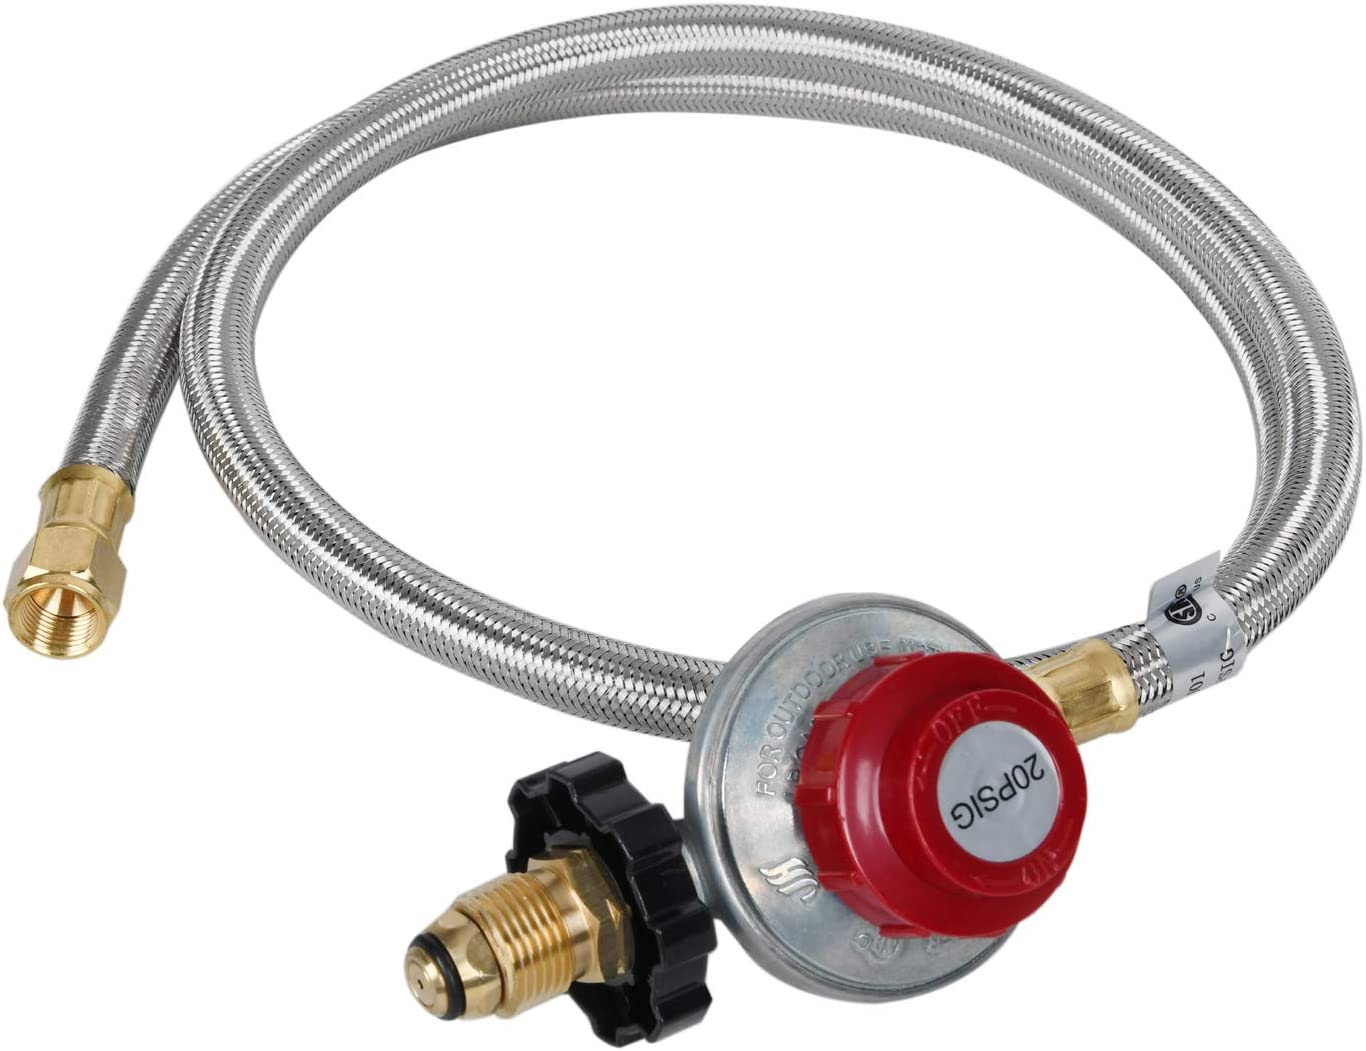 GasSaf 5FT 0-20 PSI High Pressure Adjustable Propane Regulator with Braided Stainless Steel LP/LPG Hose for POL Type BBQ Grill, Turkey Fryer, Propane Burner - 3/8'' Female Flare Fitting